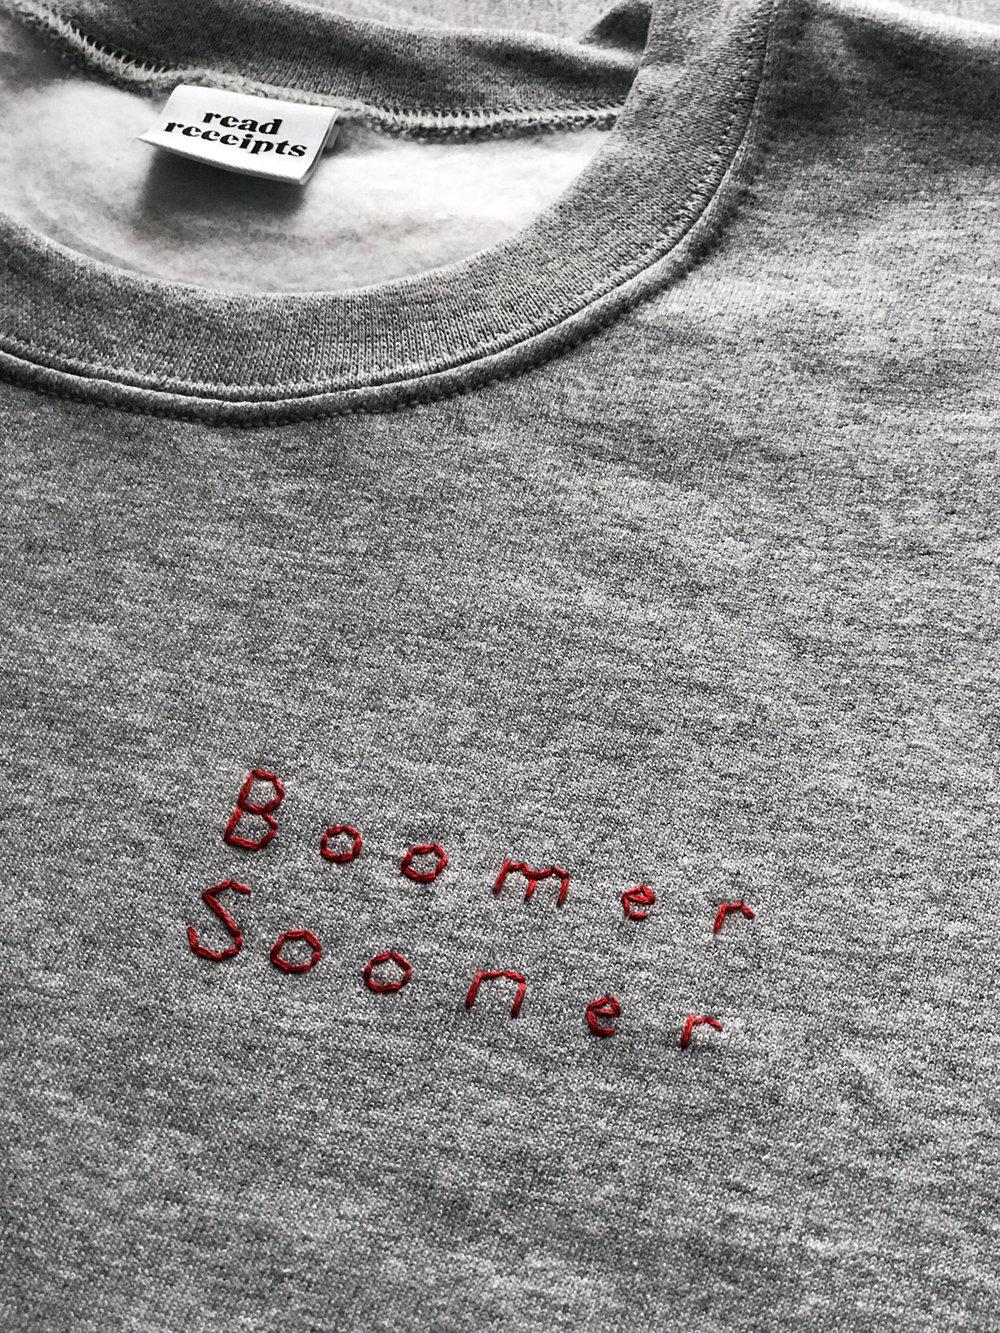 boomersooner.jpg